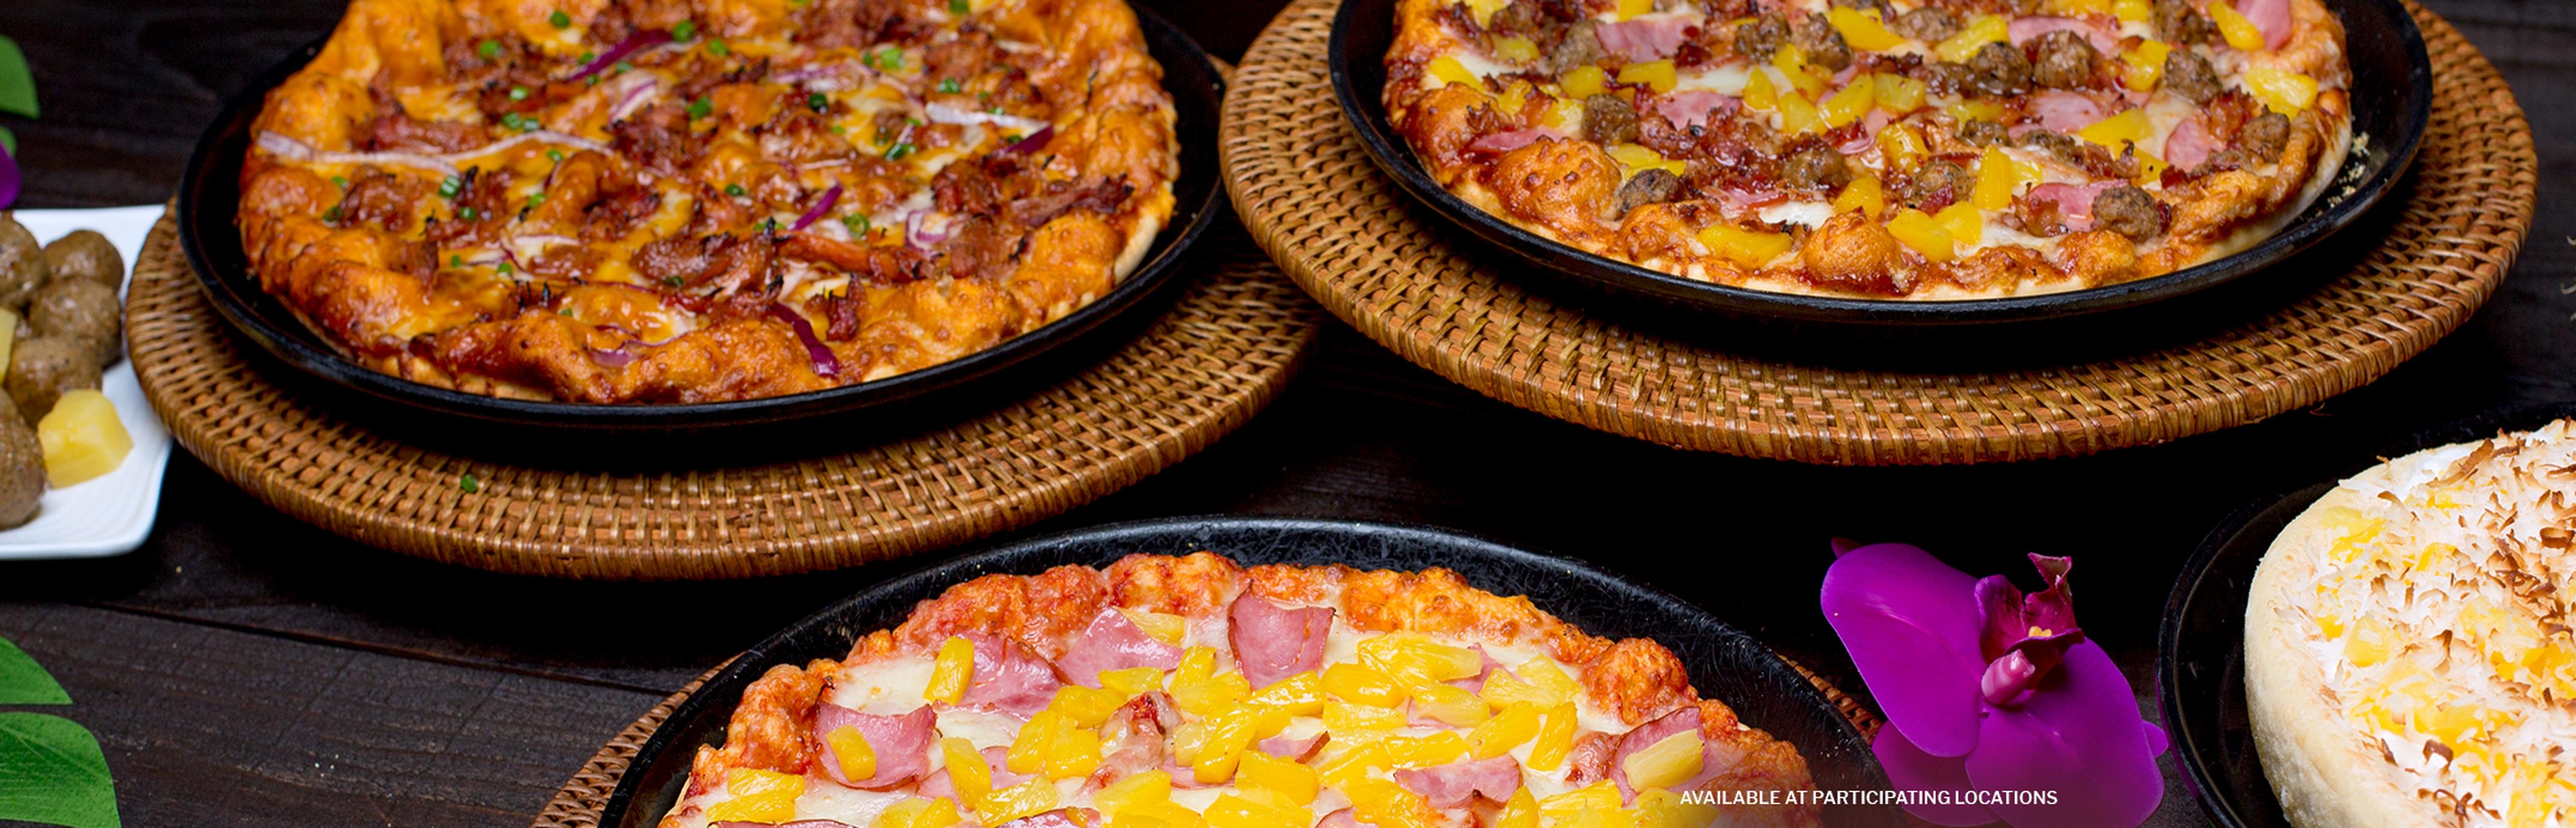 Shakey's Hero Image - Tropical Trio of Pizzas